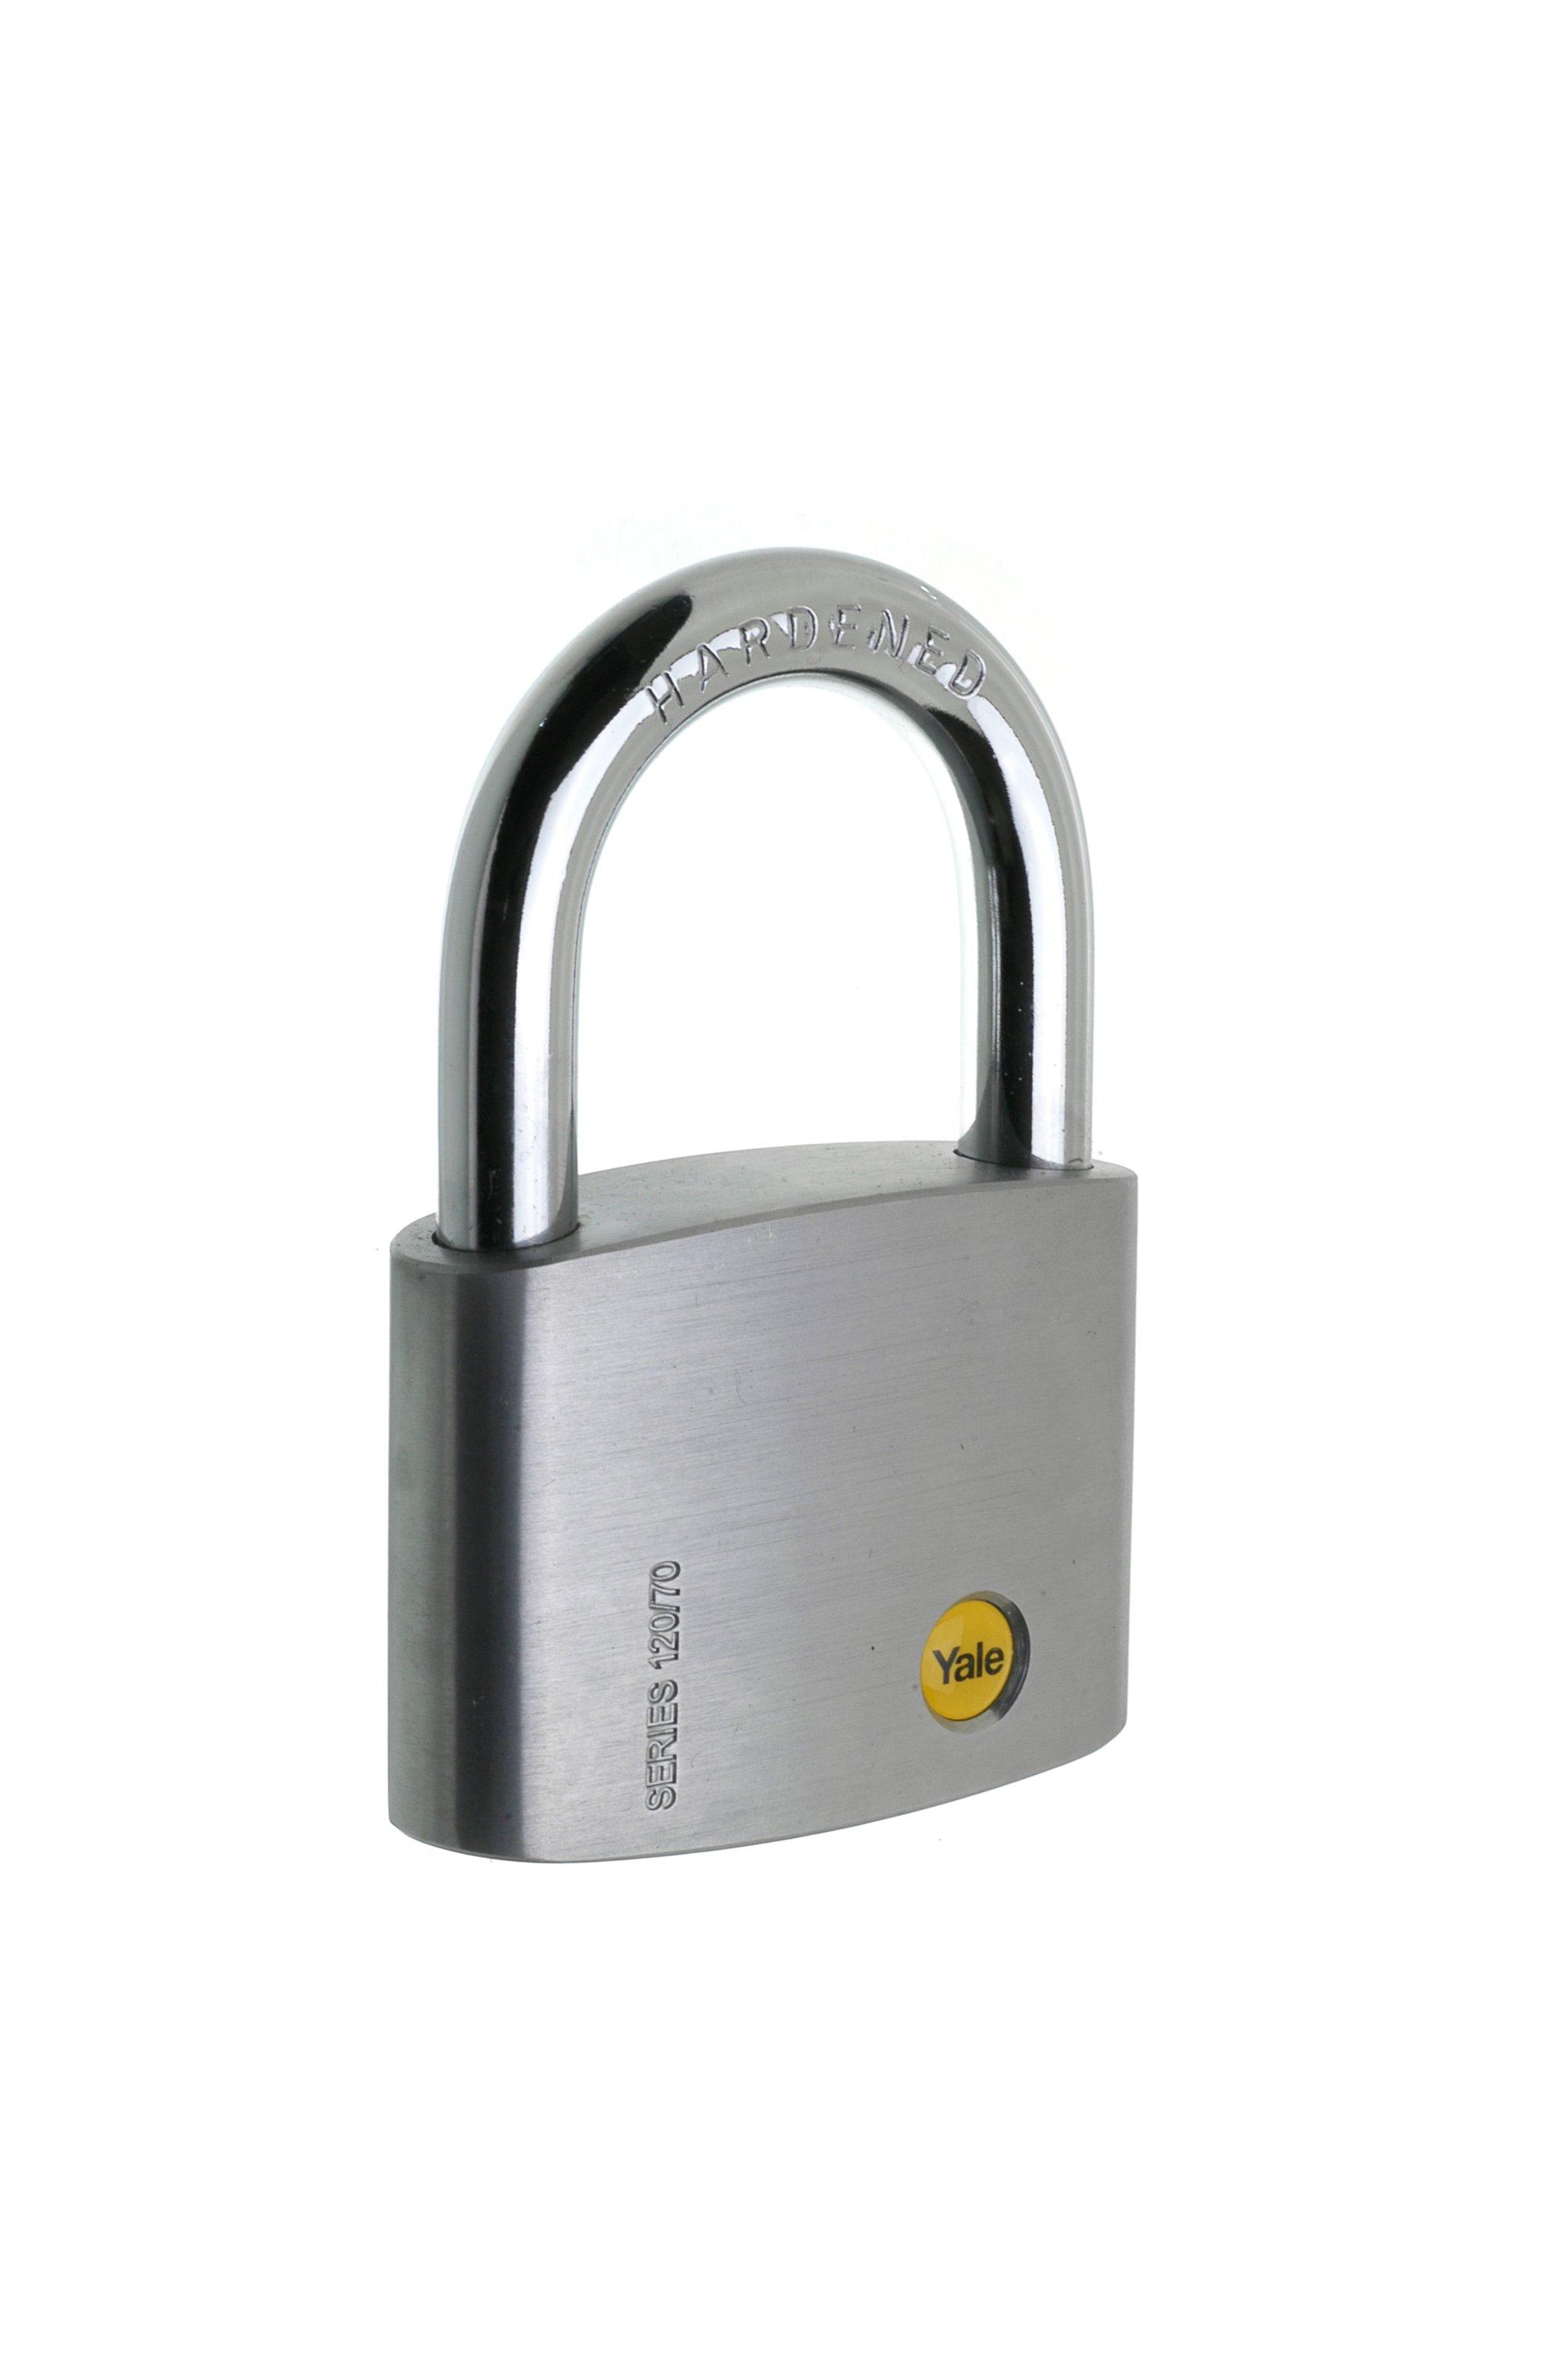 Special Y series padlock